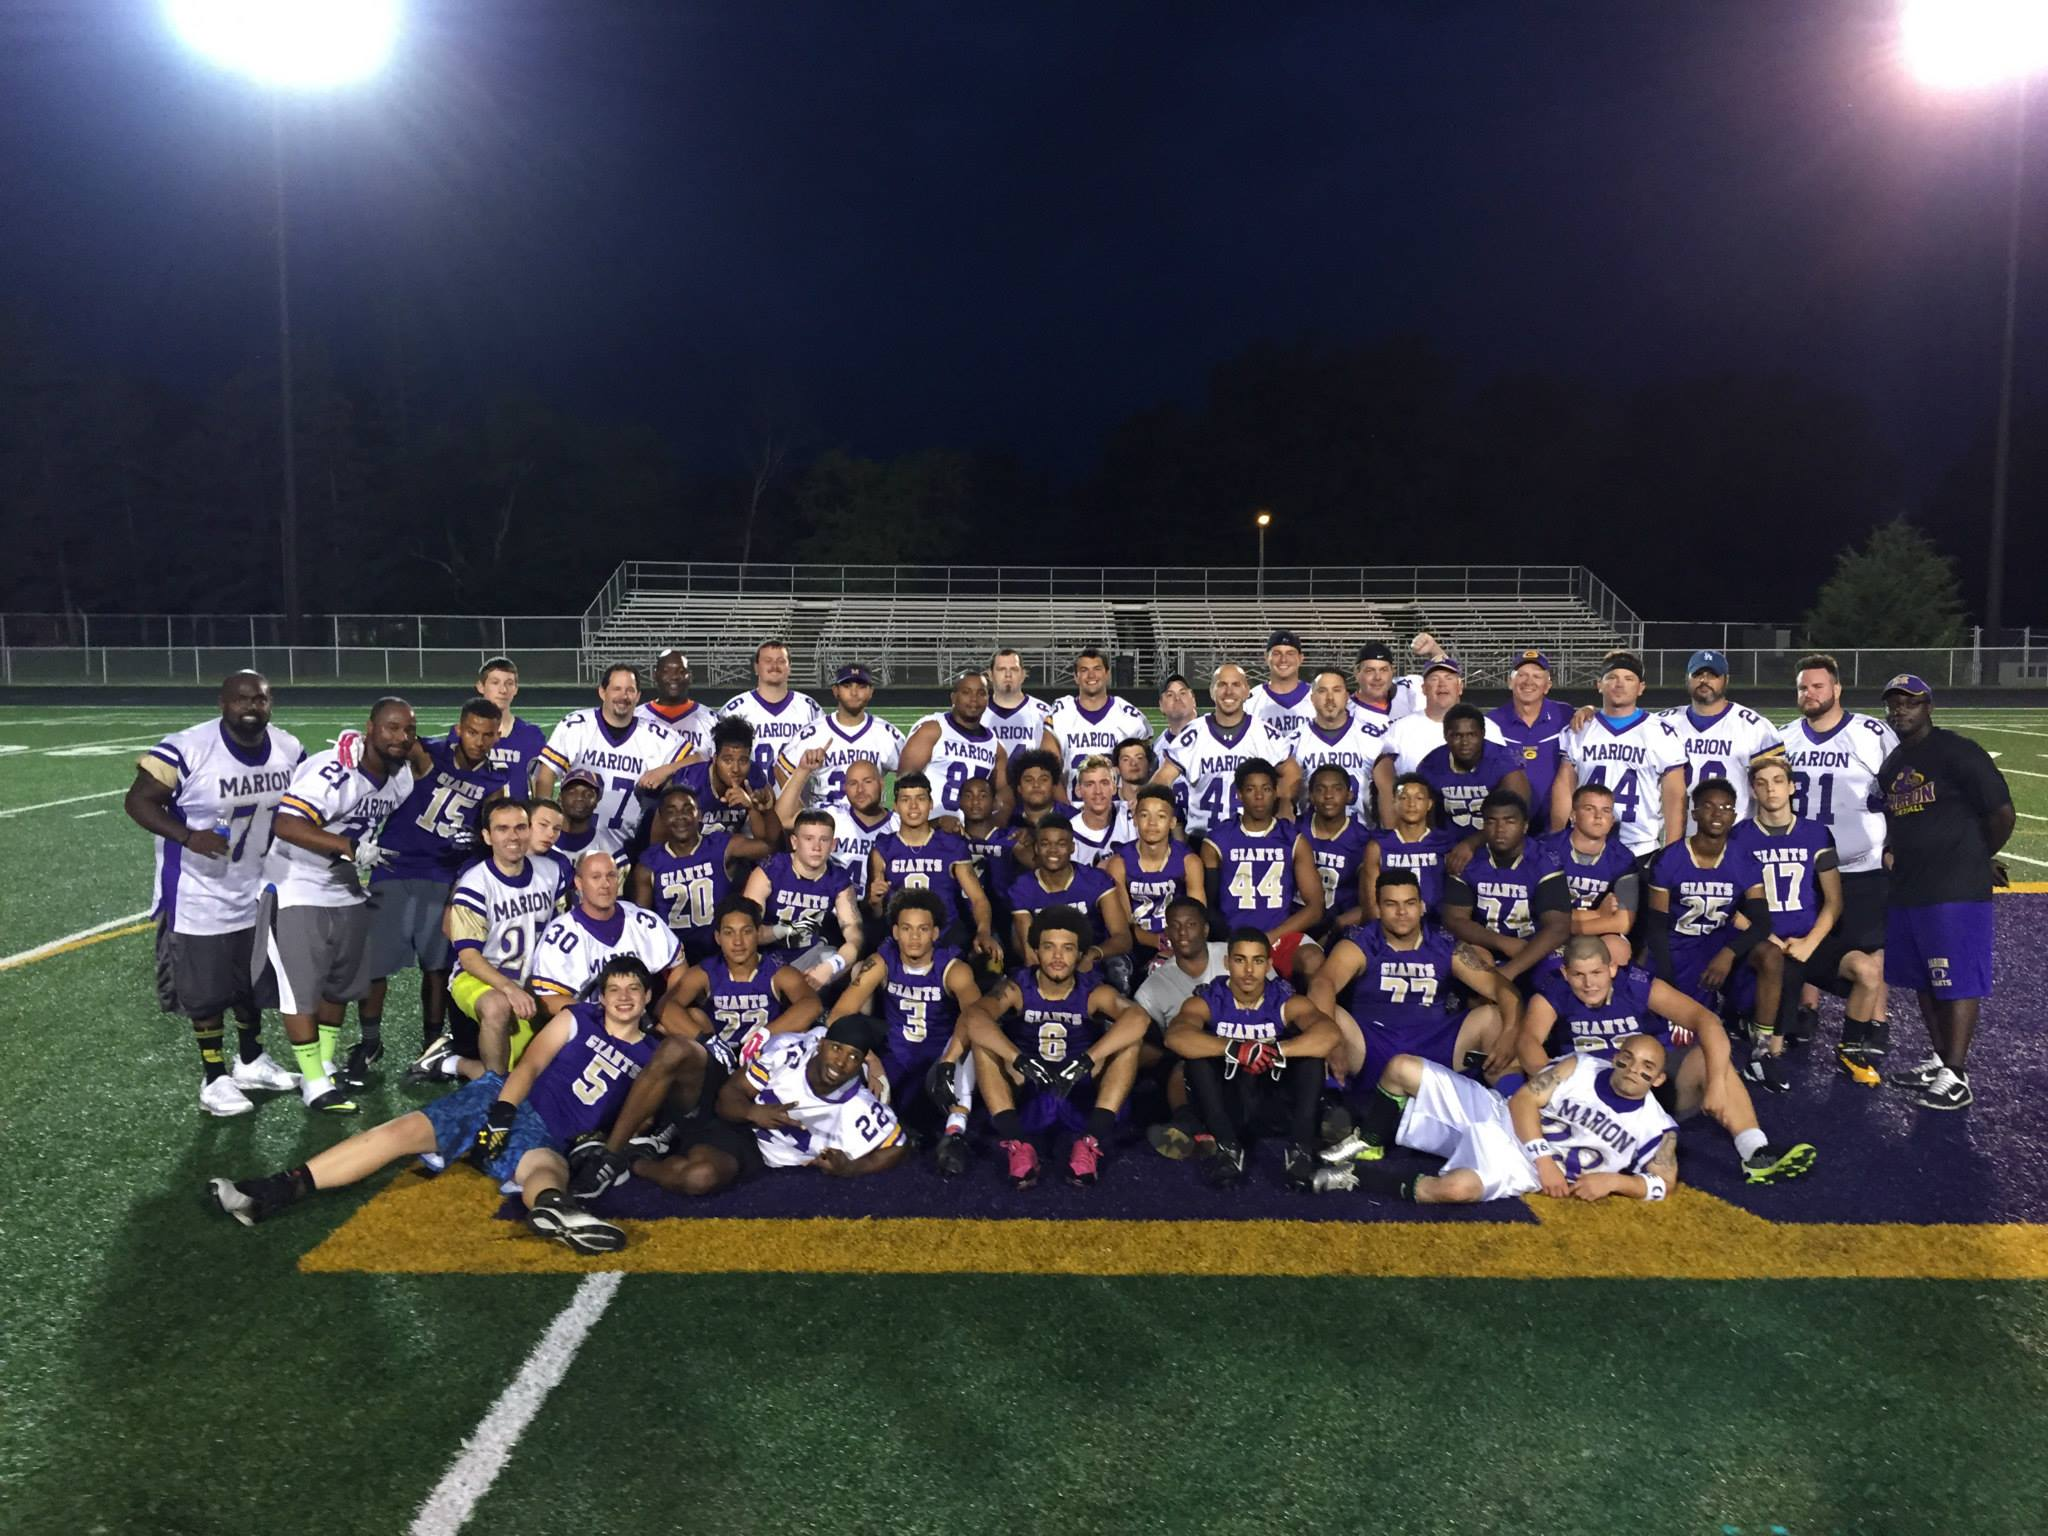 Giant Challenge 2015 football teams